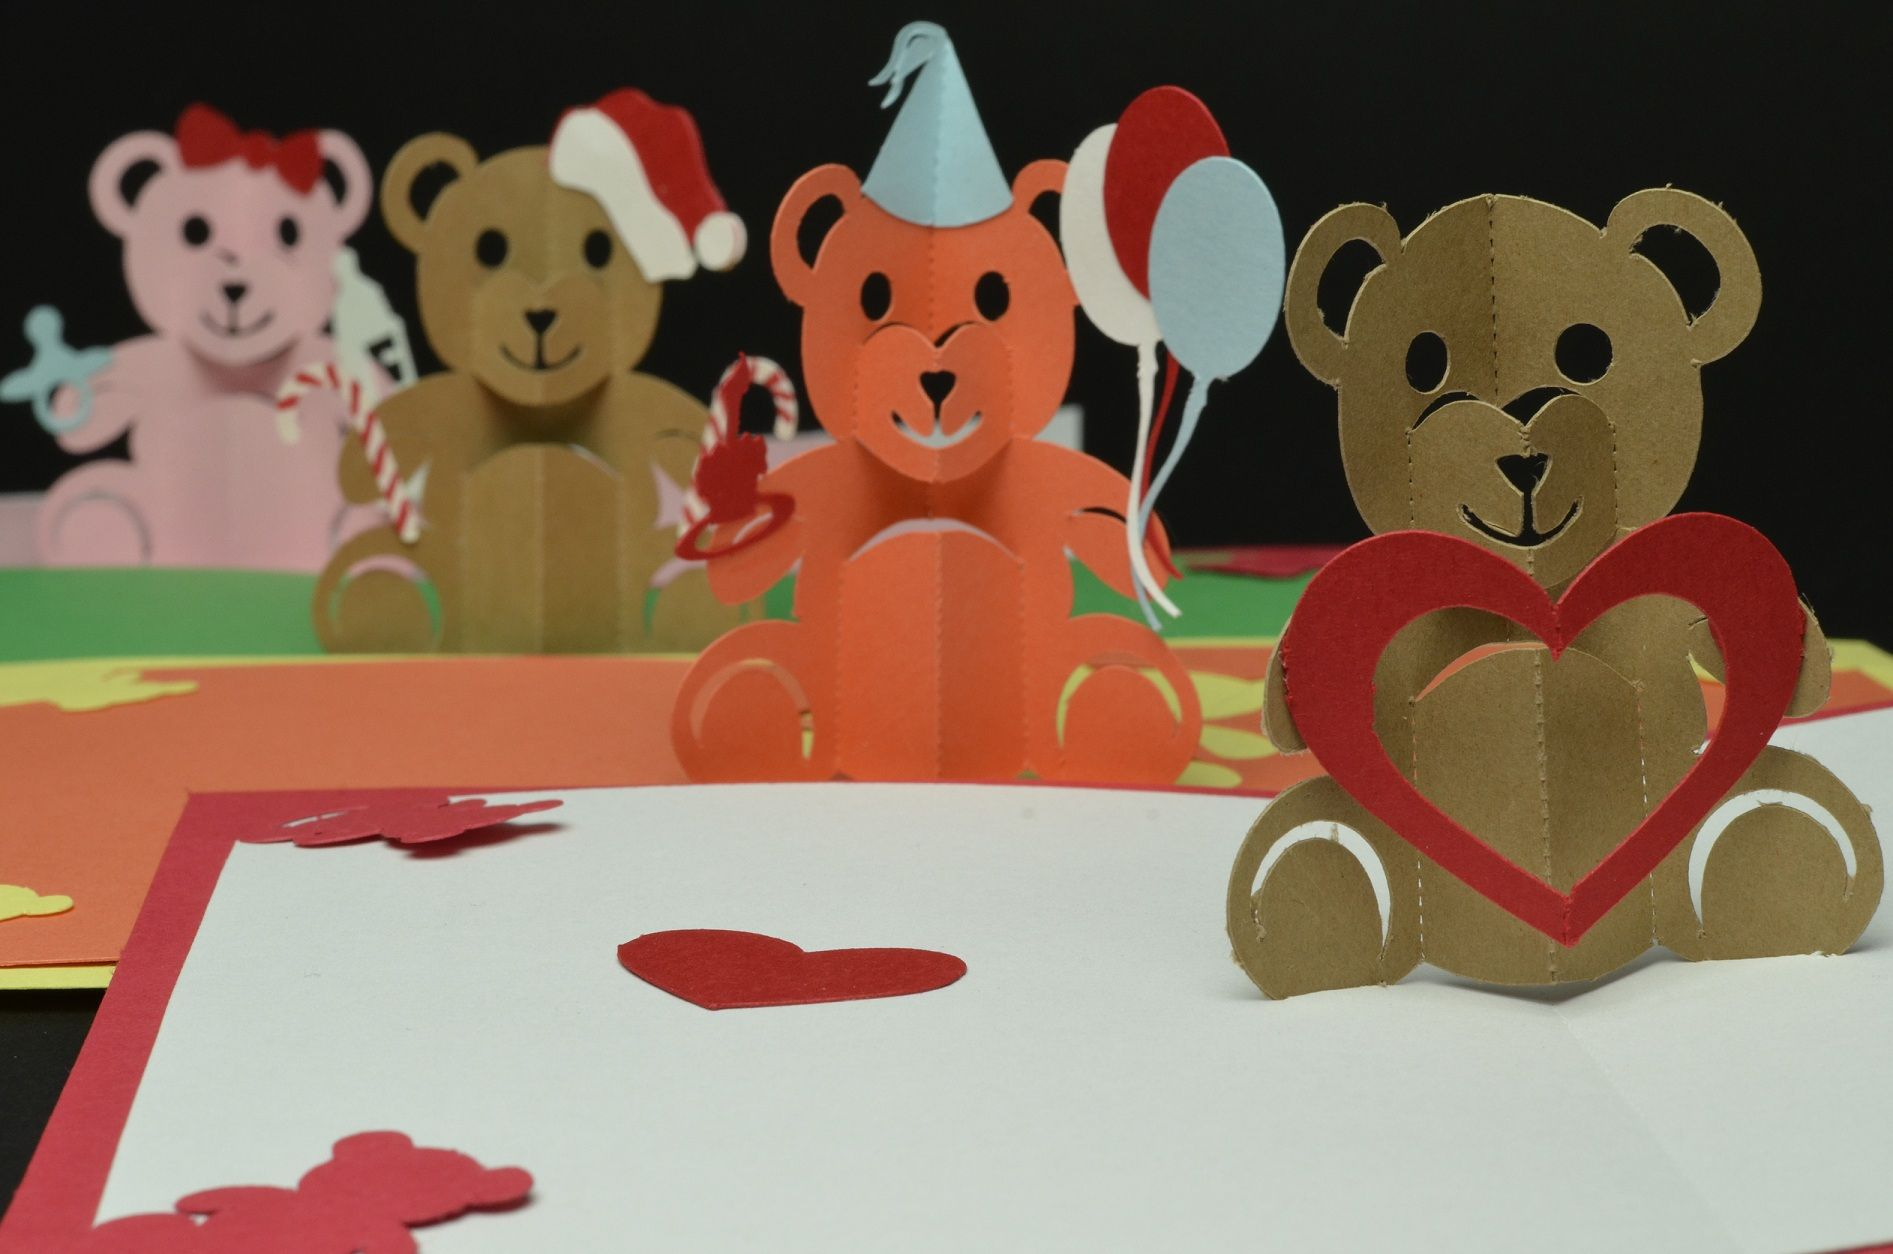 Teddy Bear Pop Up Card Valentines Day Birthday Christmas With Regard To Teddy Bear Pop Up Card Tem In 2020 Pop Up Card Templates Pop Up Valentine Cards Pop Up Cards